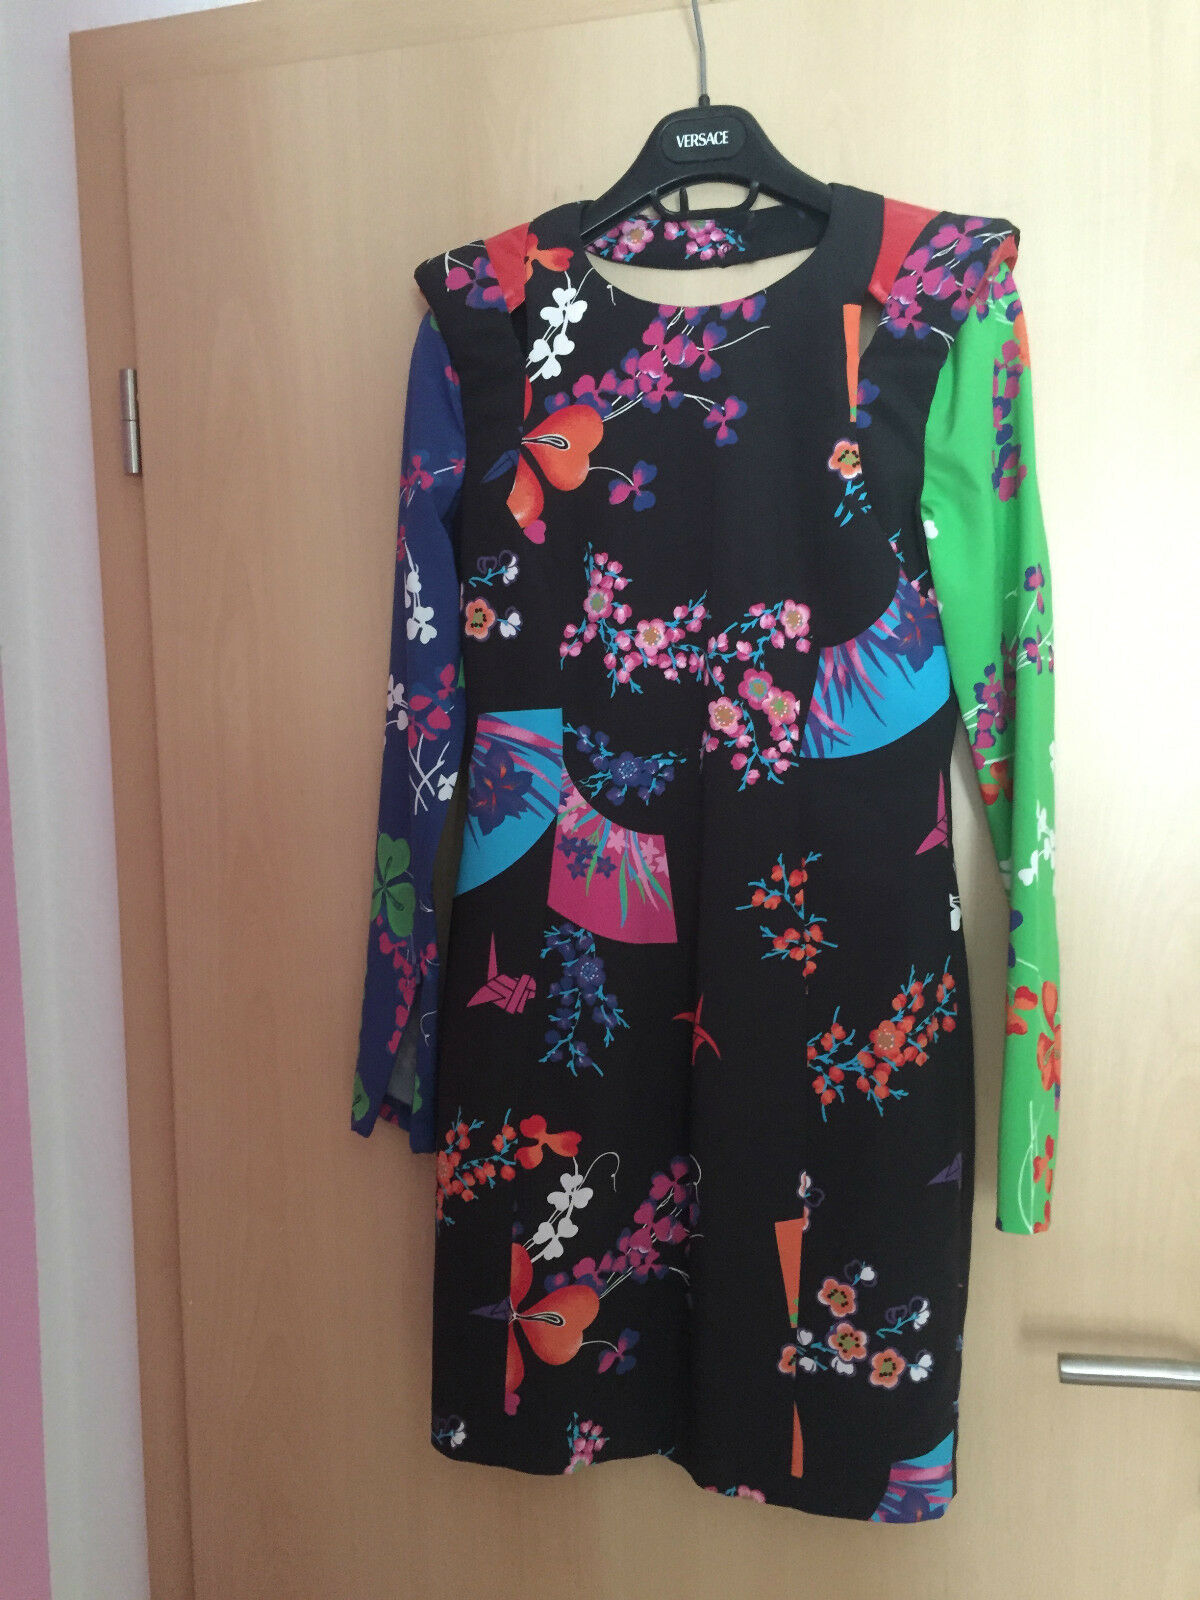 Versace for H&M Kleid Dress Seide Silk Größe EUR 34 US 4 UK 8